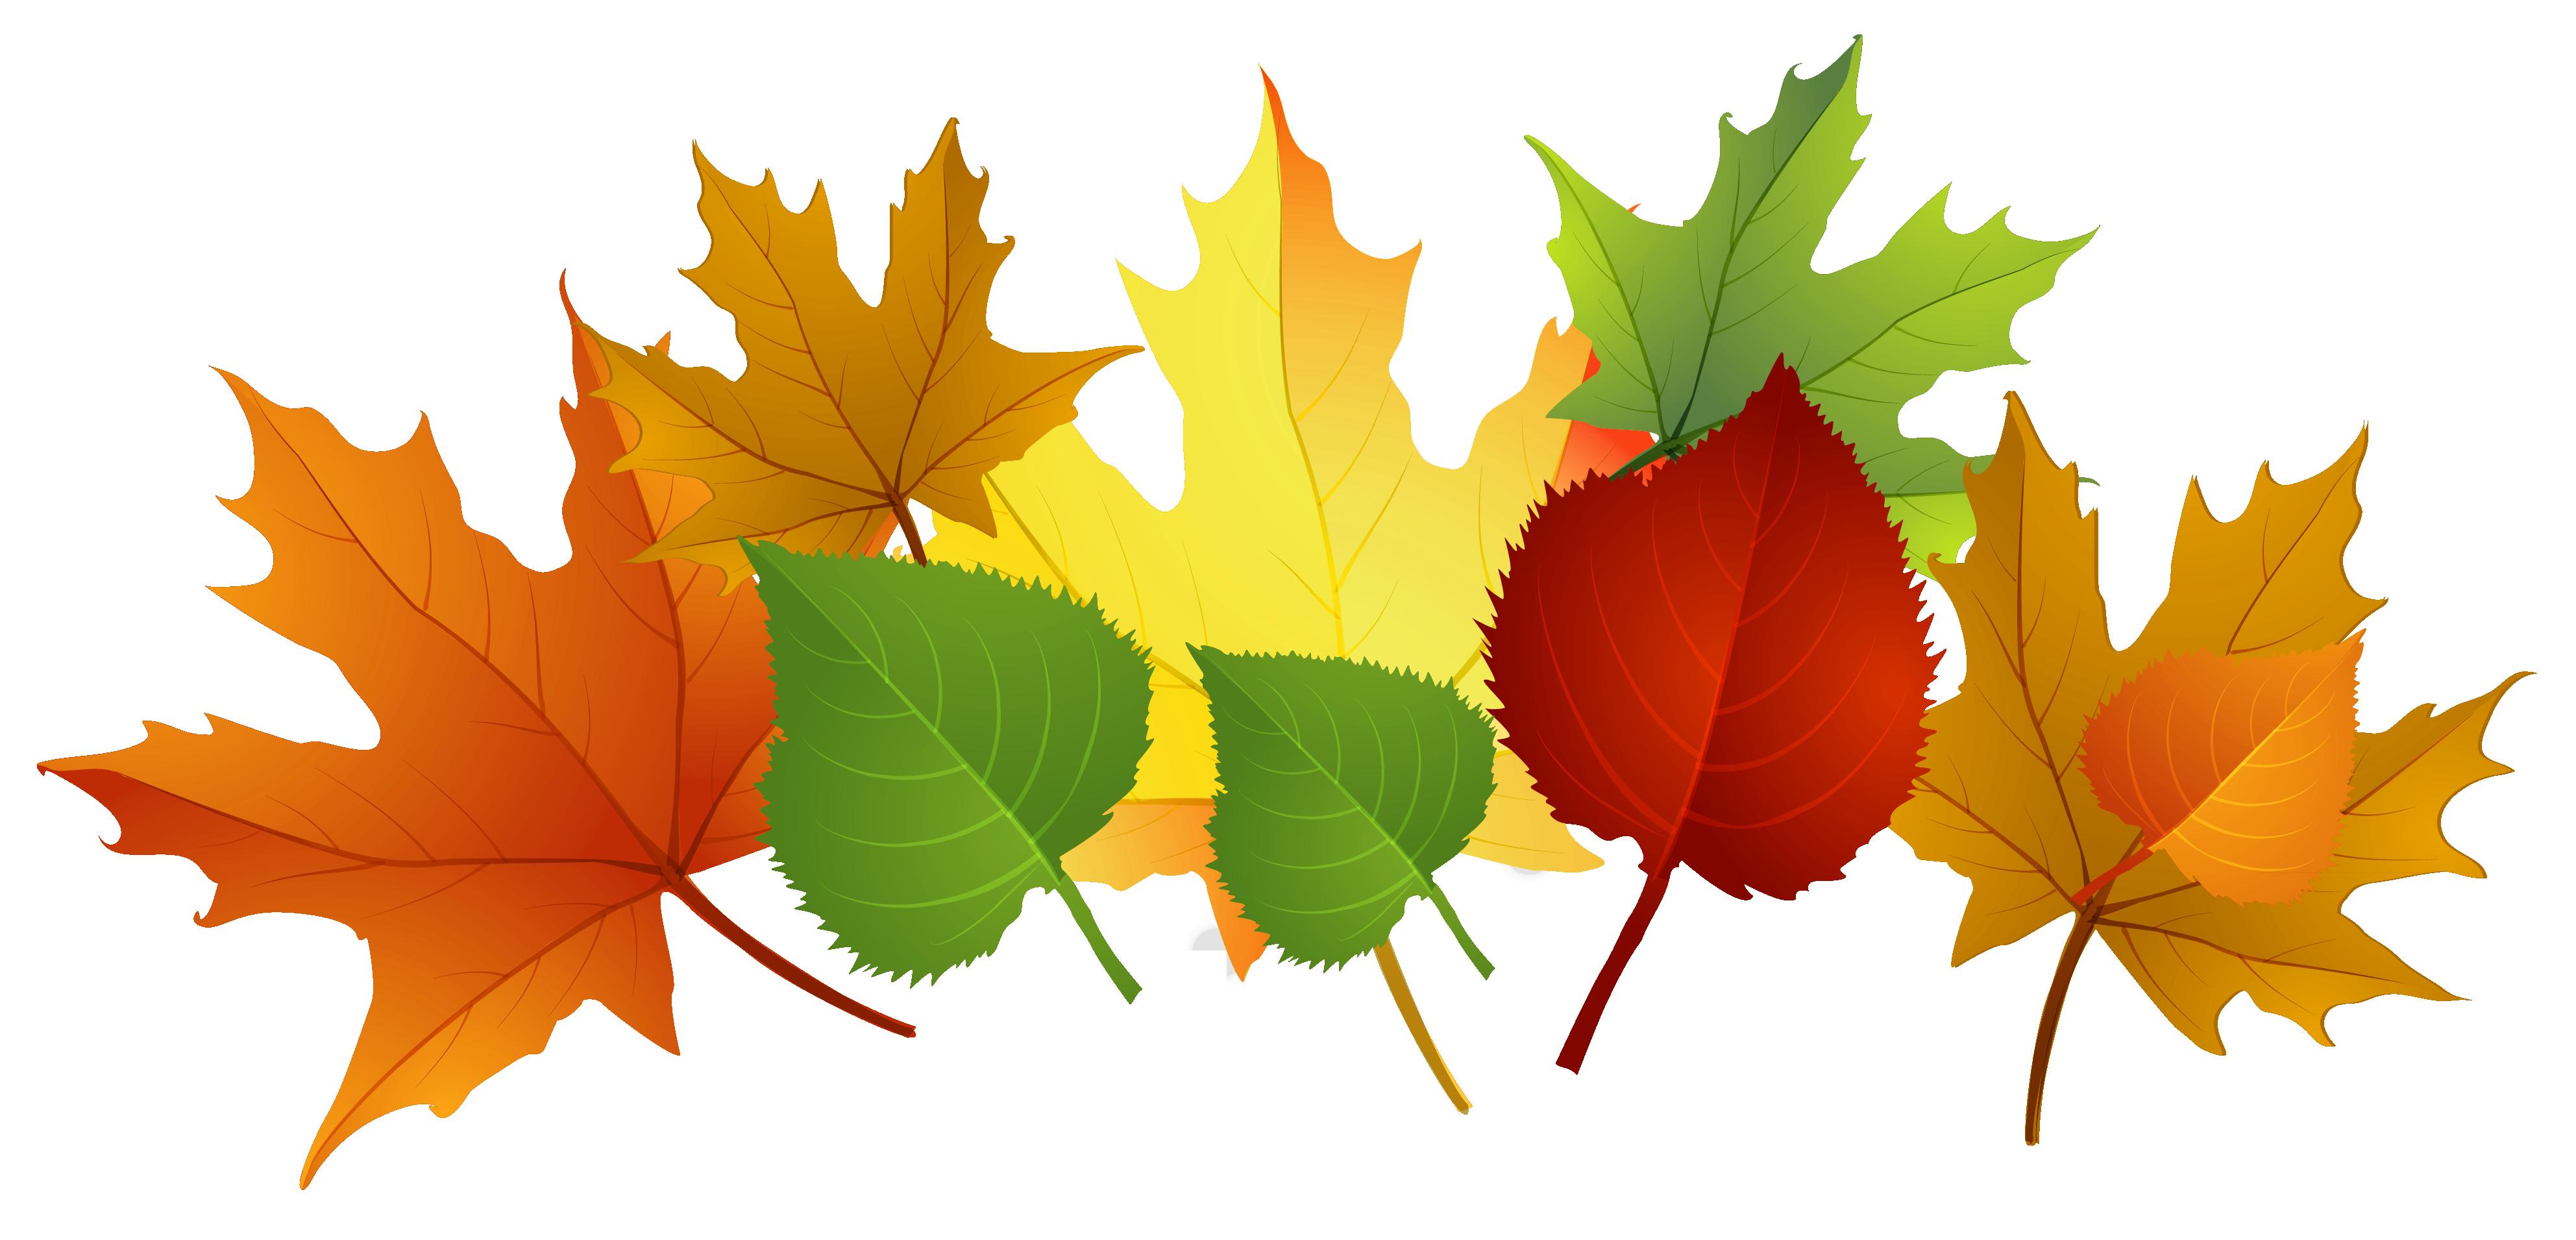 Fall Clip Art Images Free Cli - Autumn Clip Art